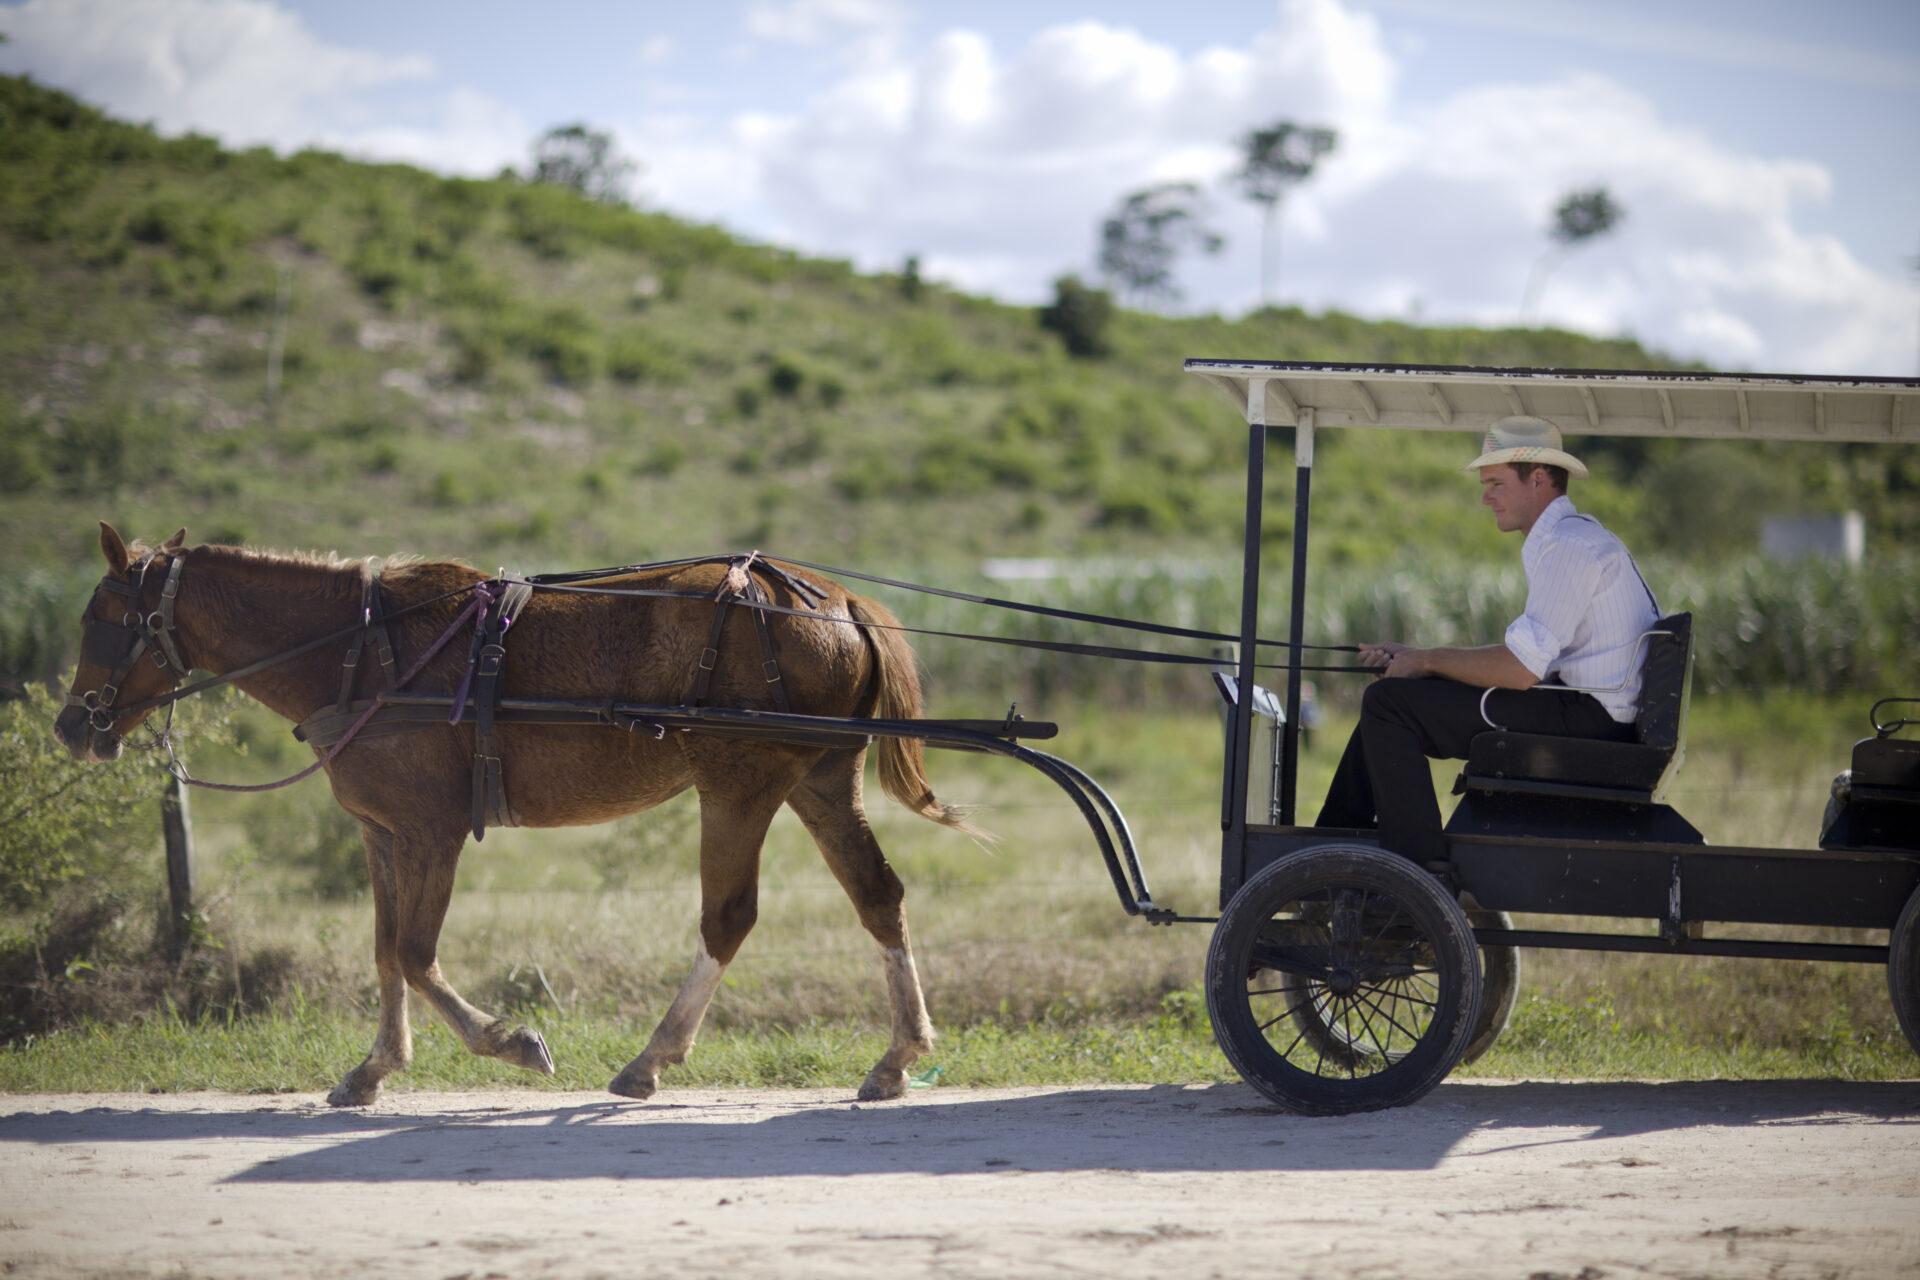 mennonites-horse-carriage-belize-tourism-board